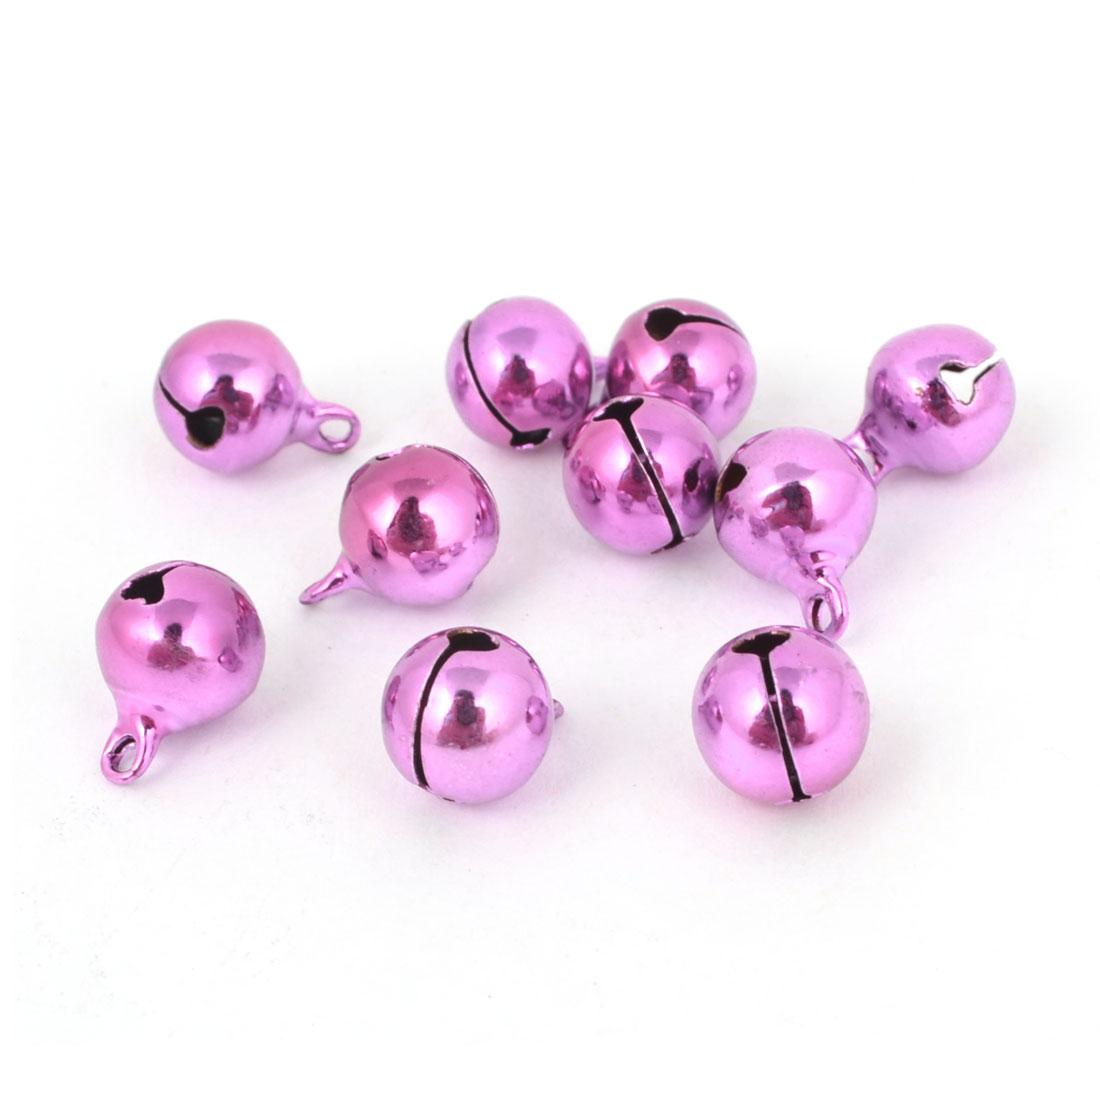 10 Pcs Pink Christmas Tree Decoration 10mm Metal Ring Bells